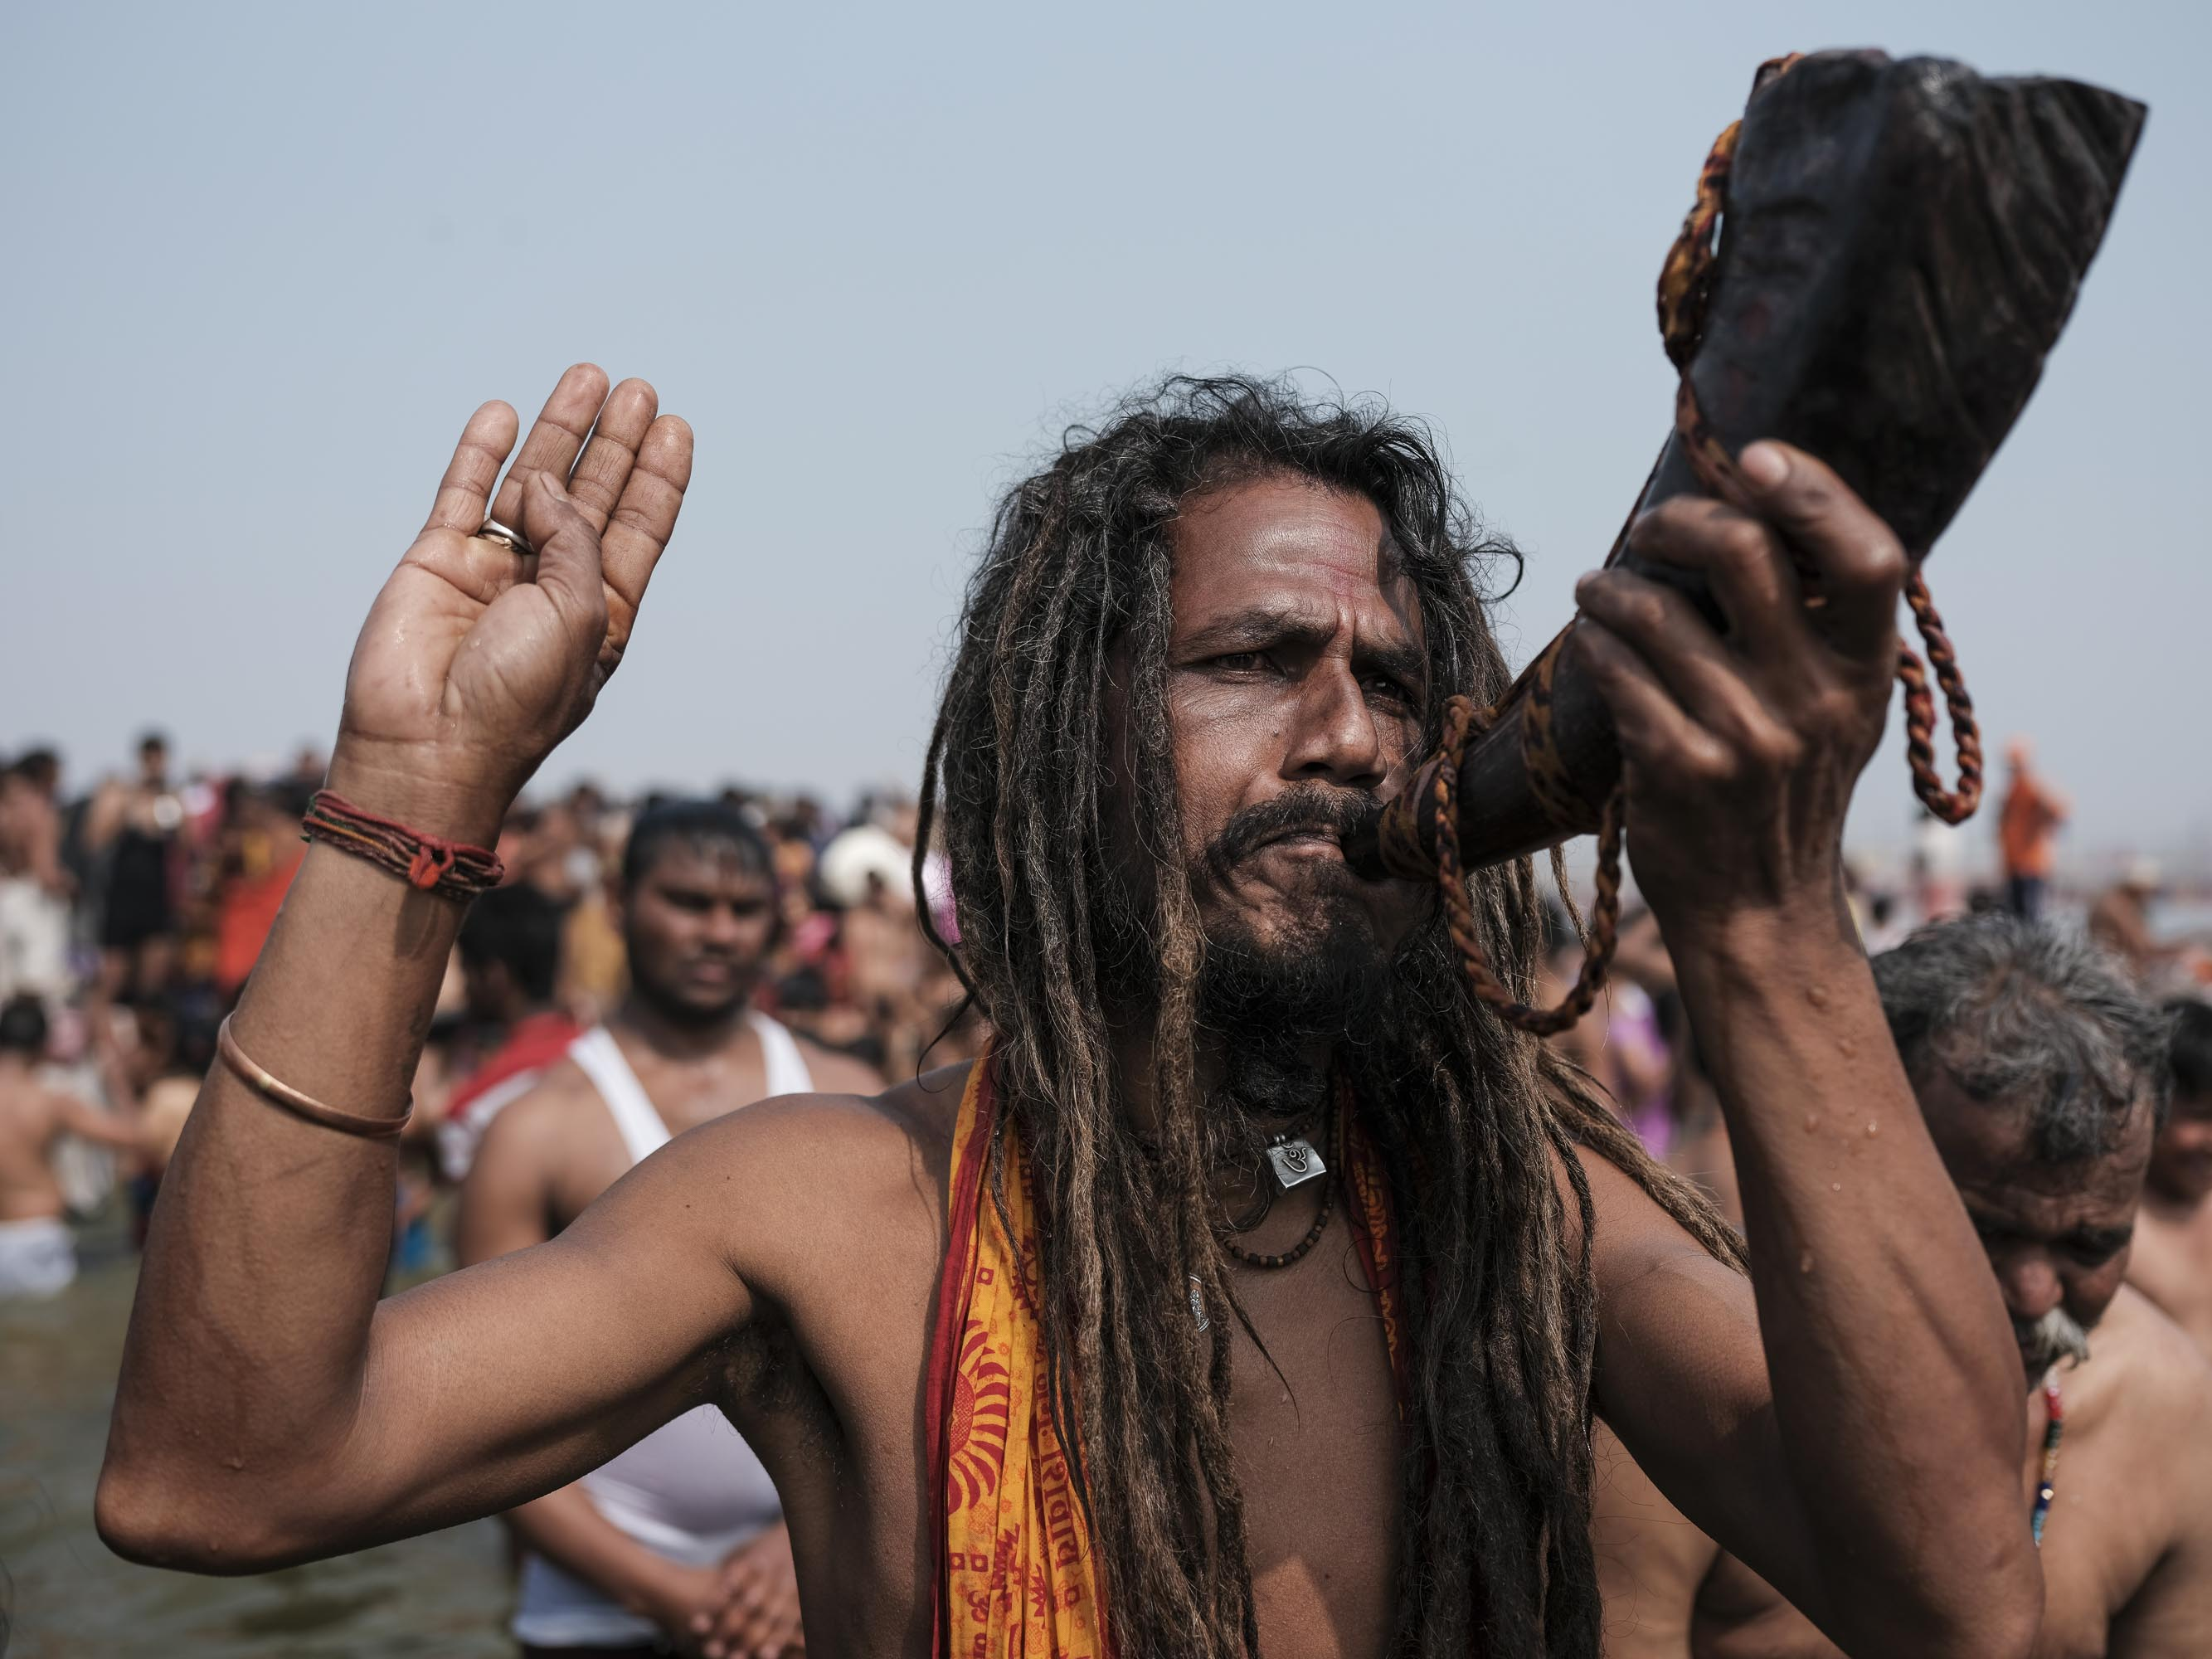 in the water baba hair pilgrims Kumbh mela 2019 India Allahabad Prayagraj Ardh hindu religious Festival event rivers photographer jose jeuland photography